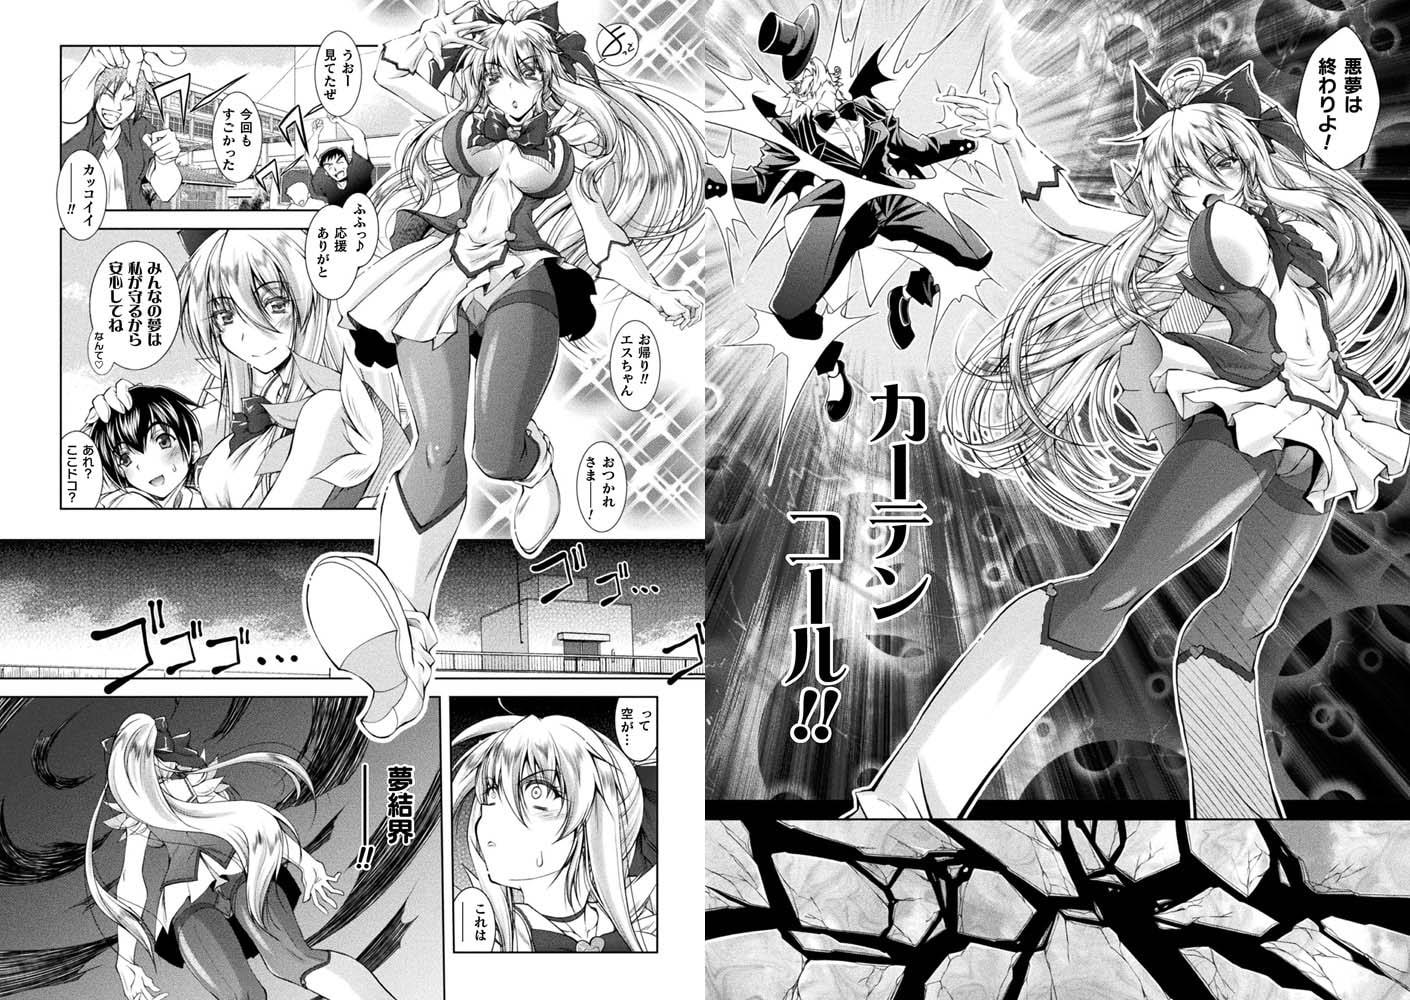 Loss Angels【電子書籍限定版】のサンプル画像